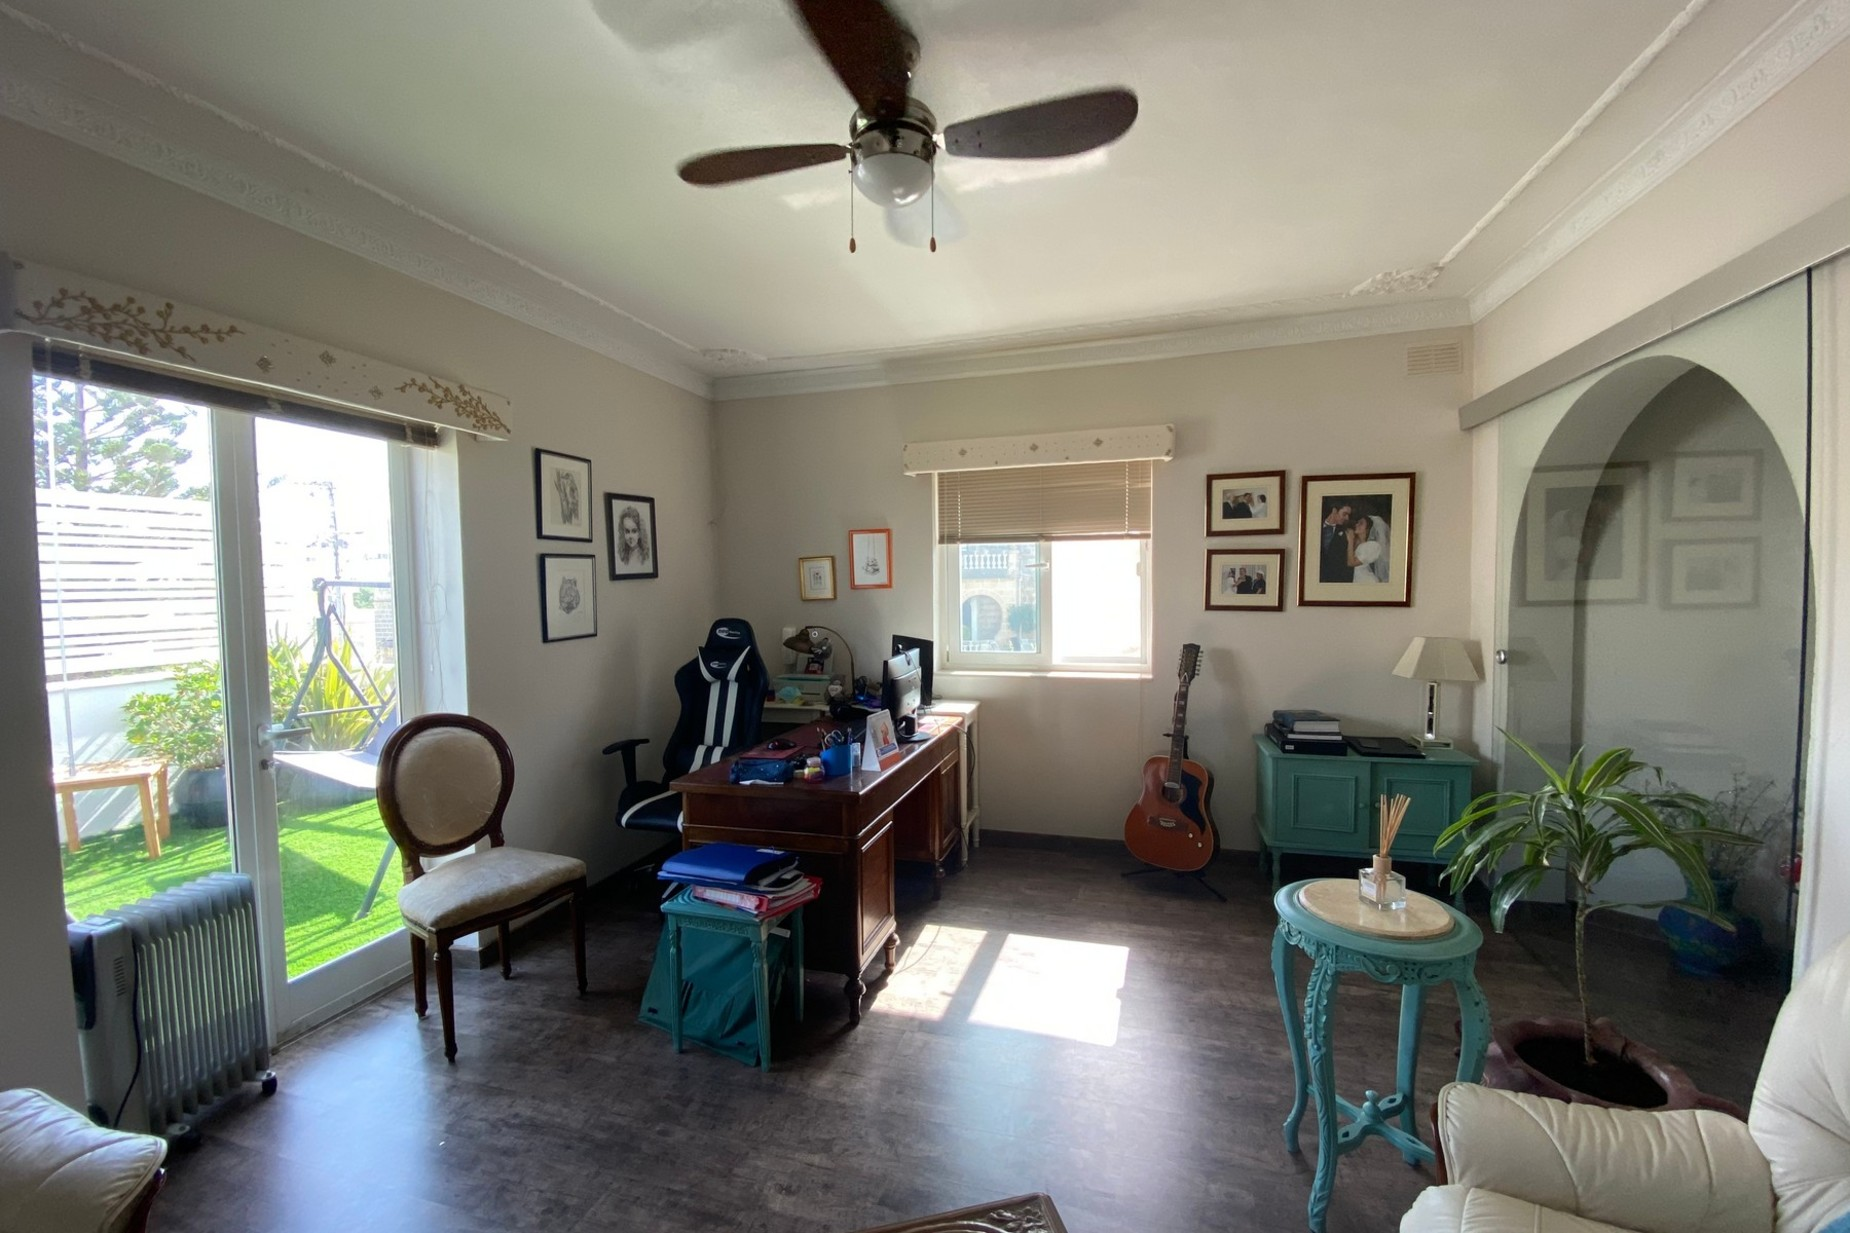 3 bed Villa For Sale in Santa Venera, Santa Venera - thumb 4